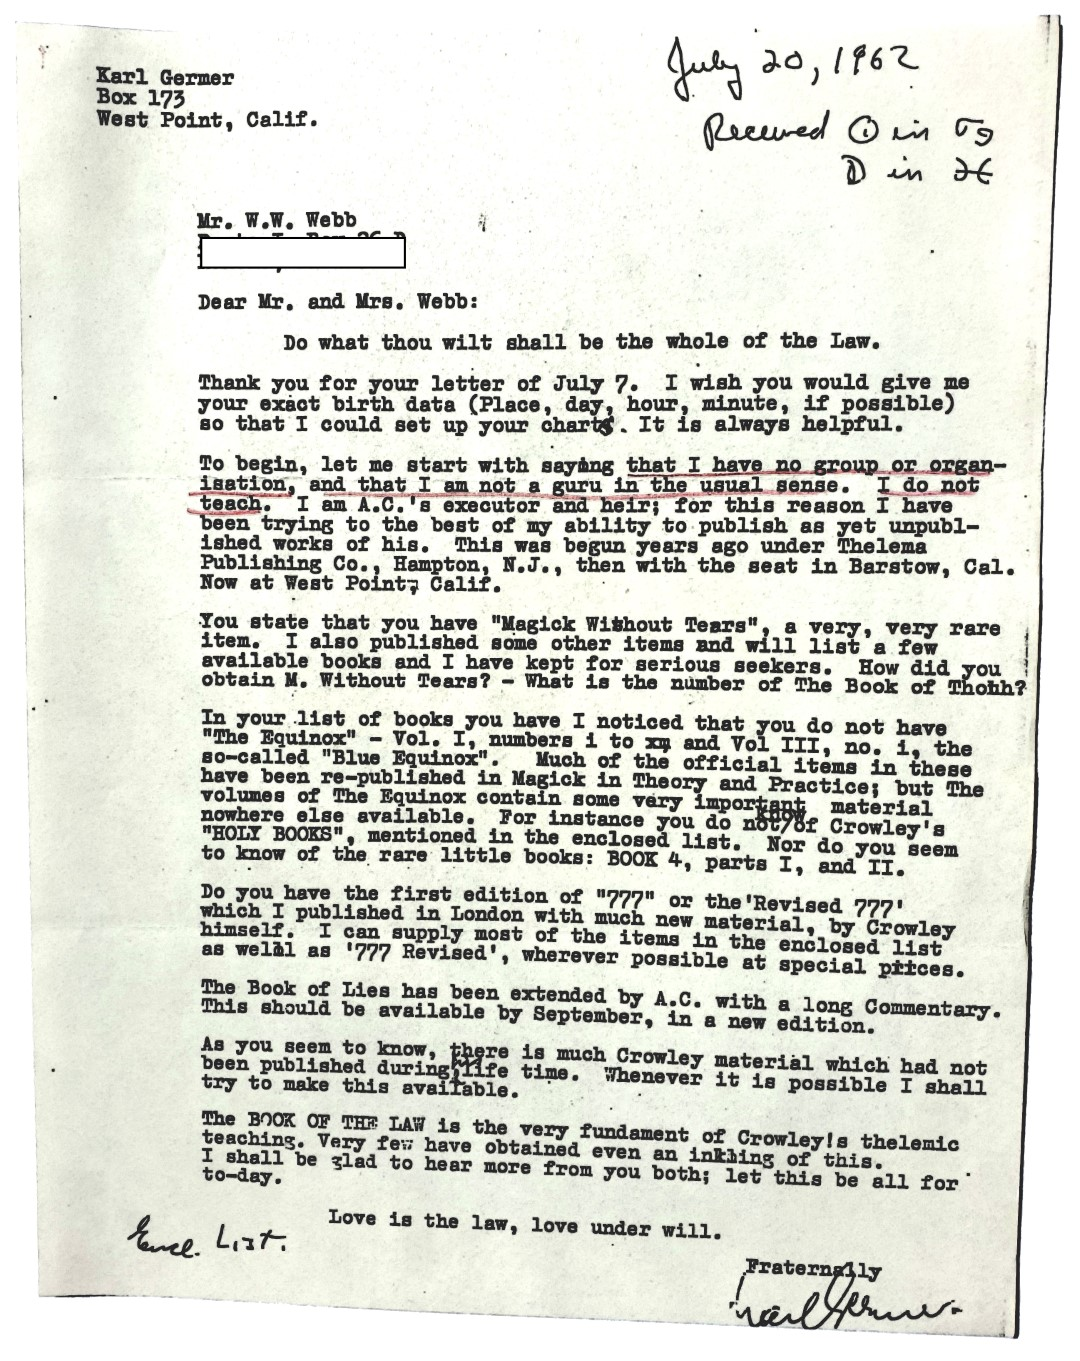 Karl Germer William Wallace Webb 1962 July 20